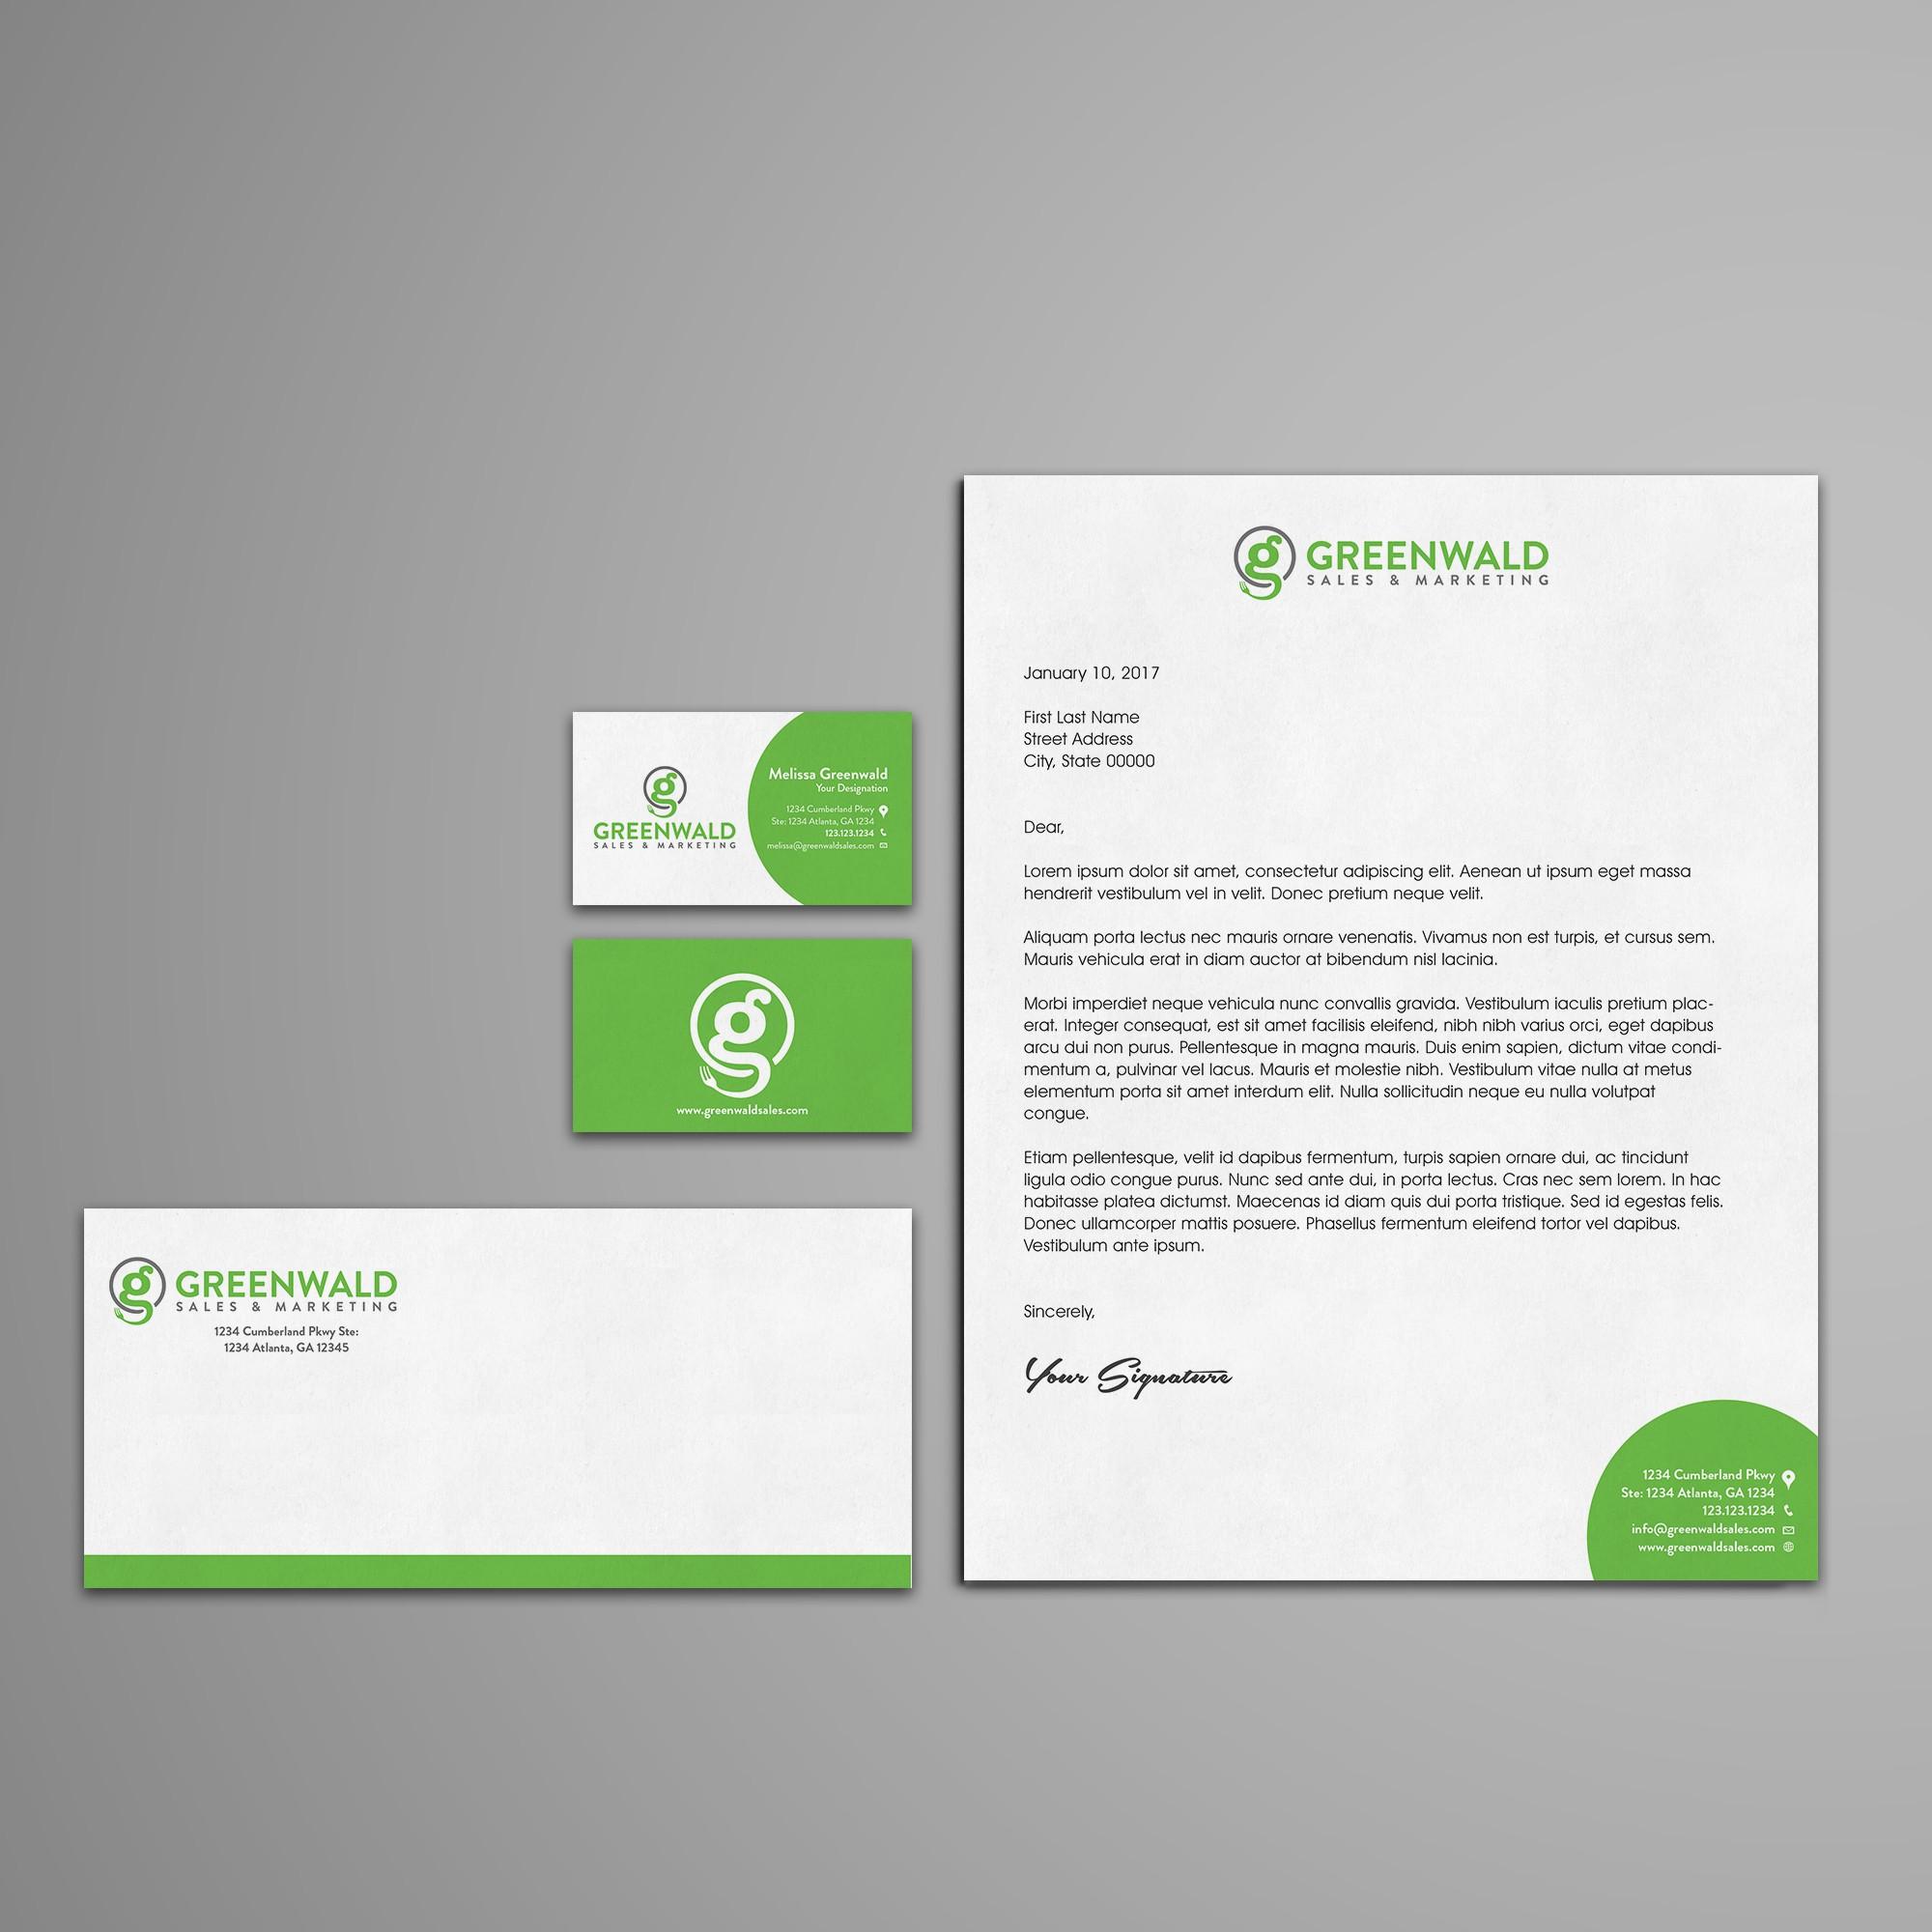 Stationery Design for Greenwald Sales & Marketing